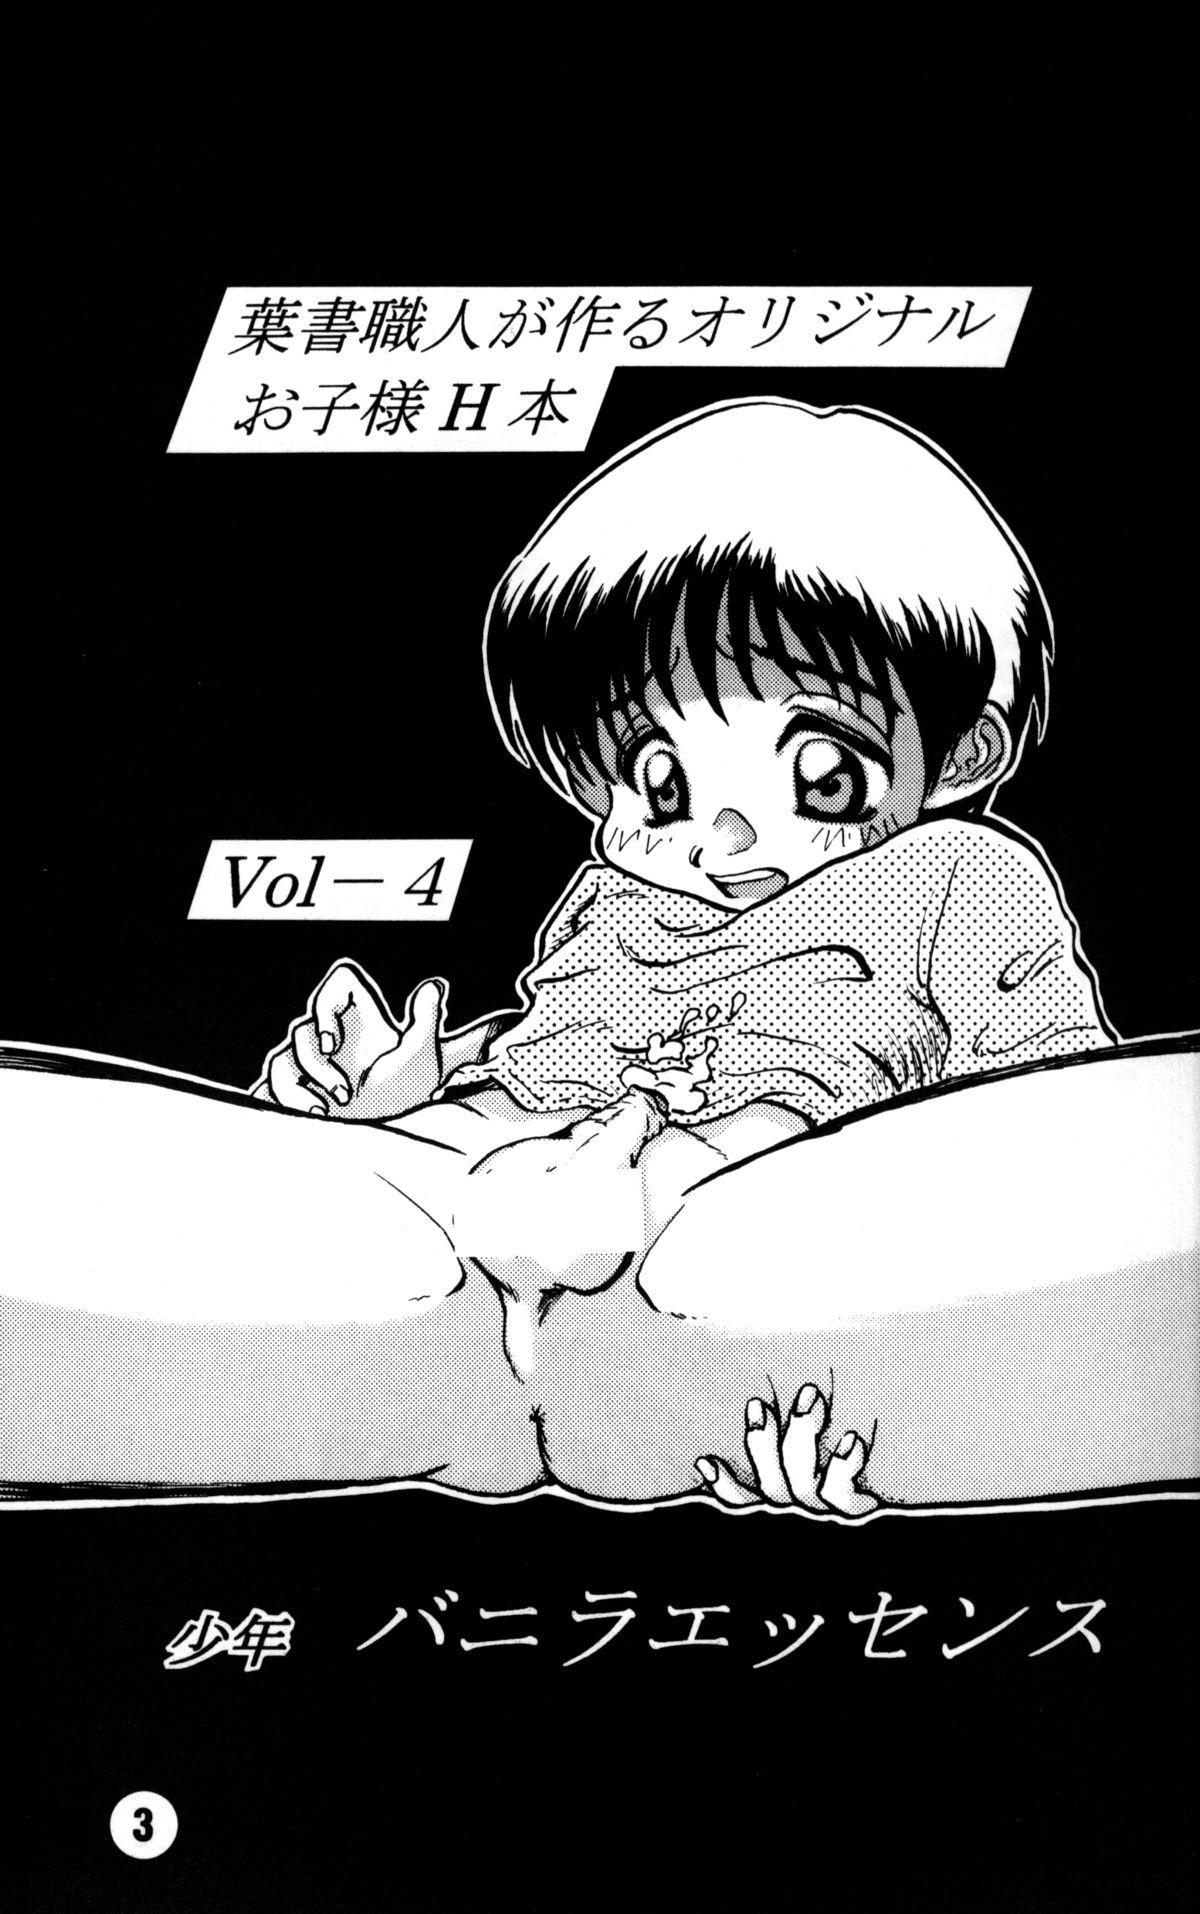 Anthology - Nekketsu Project - Volume 4 'Shounen Vanilla Essence' 1